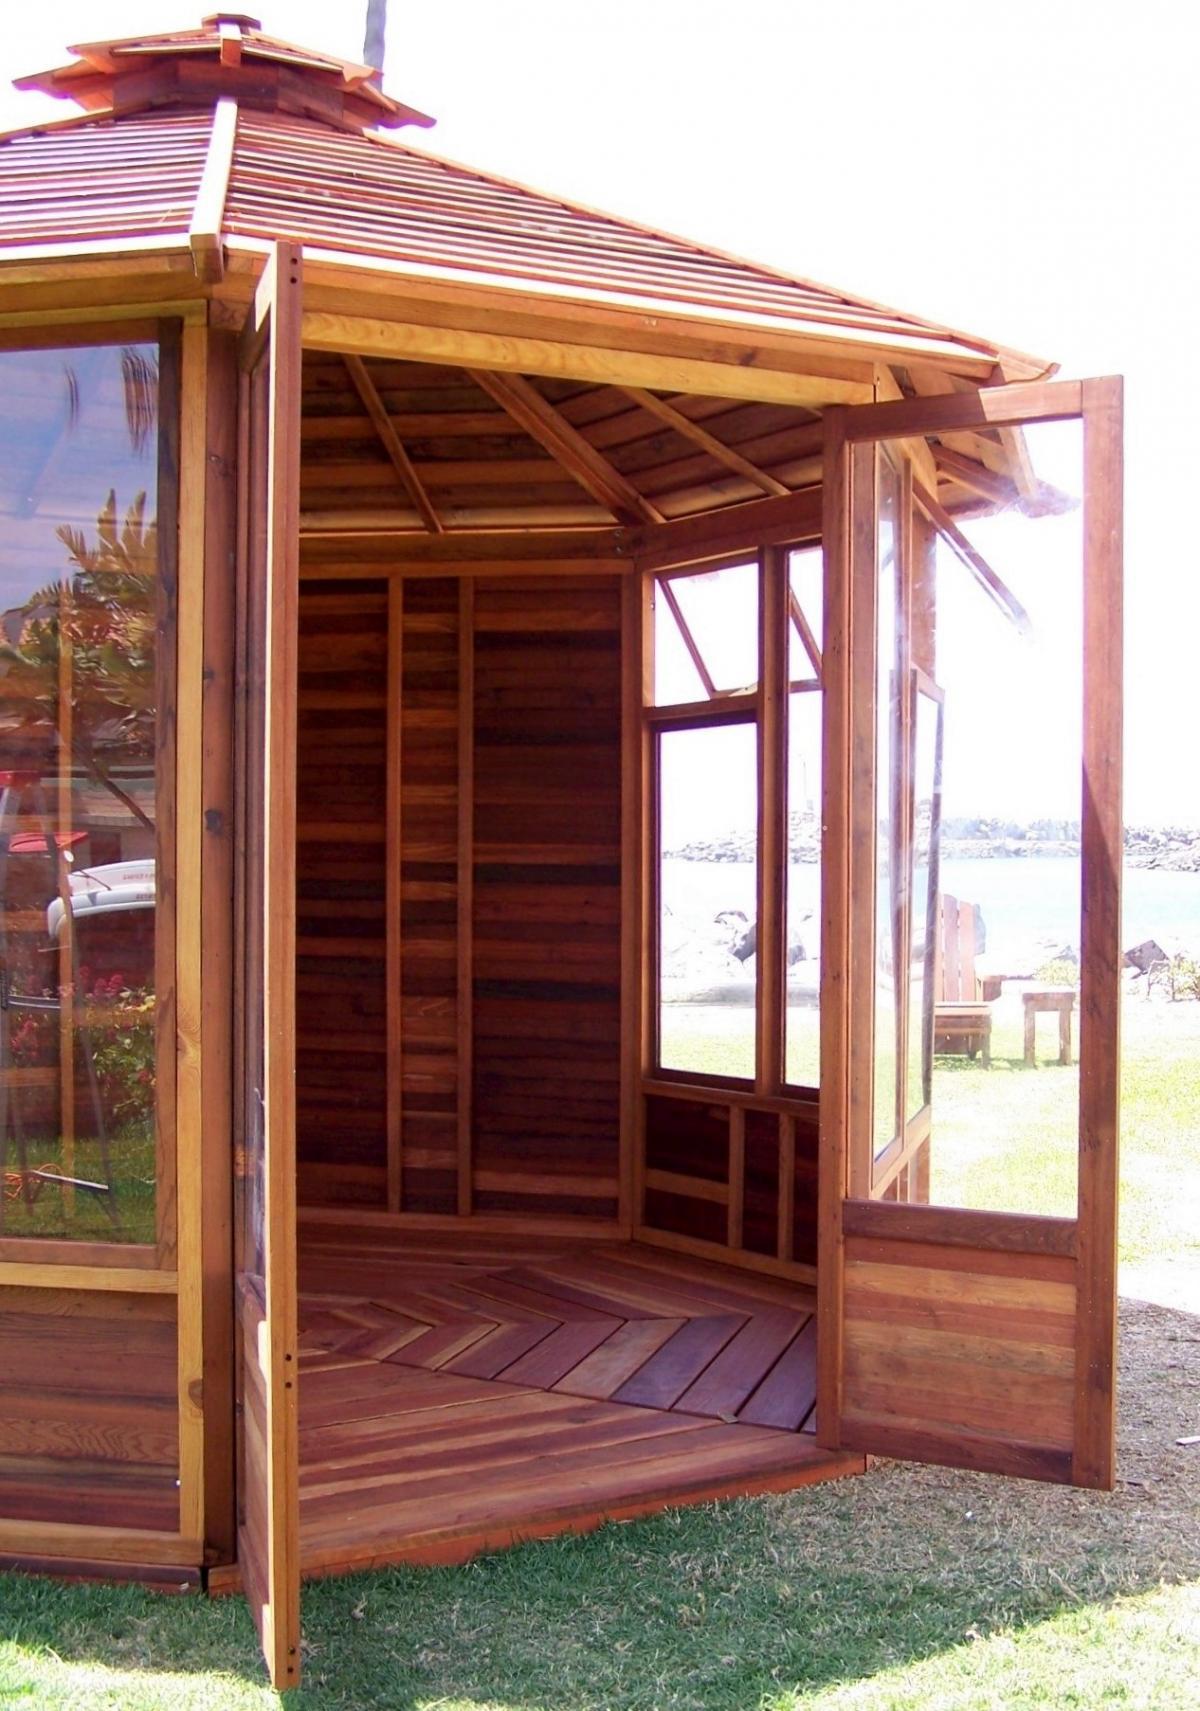 Octagonal Gazebo: Sunroom Wood Gazebo Kit for Sale